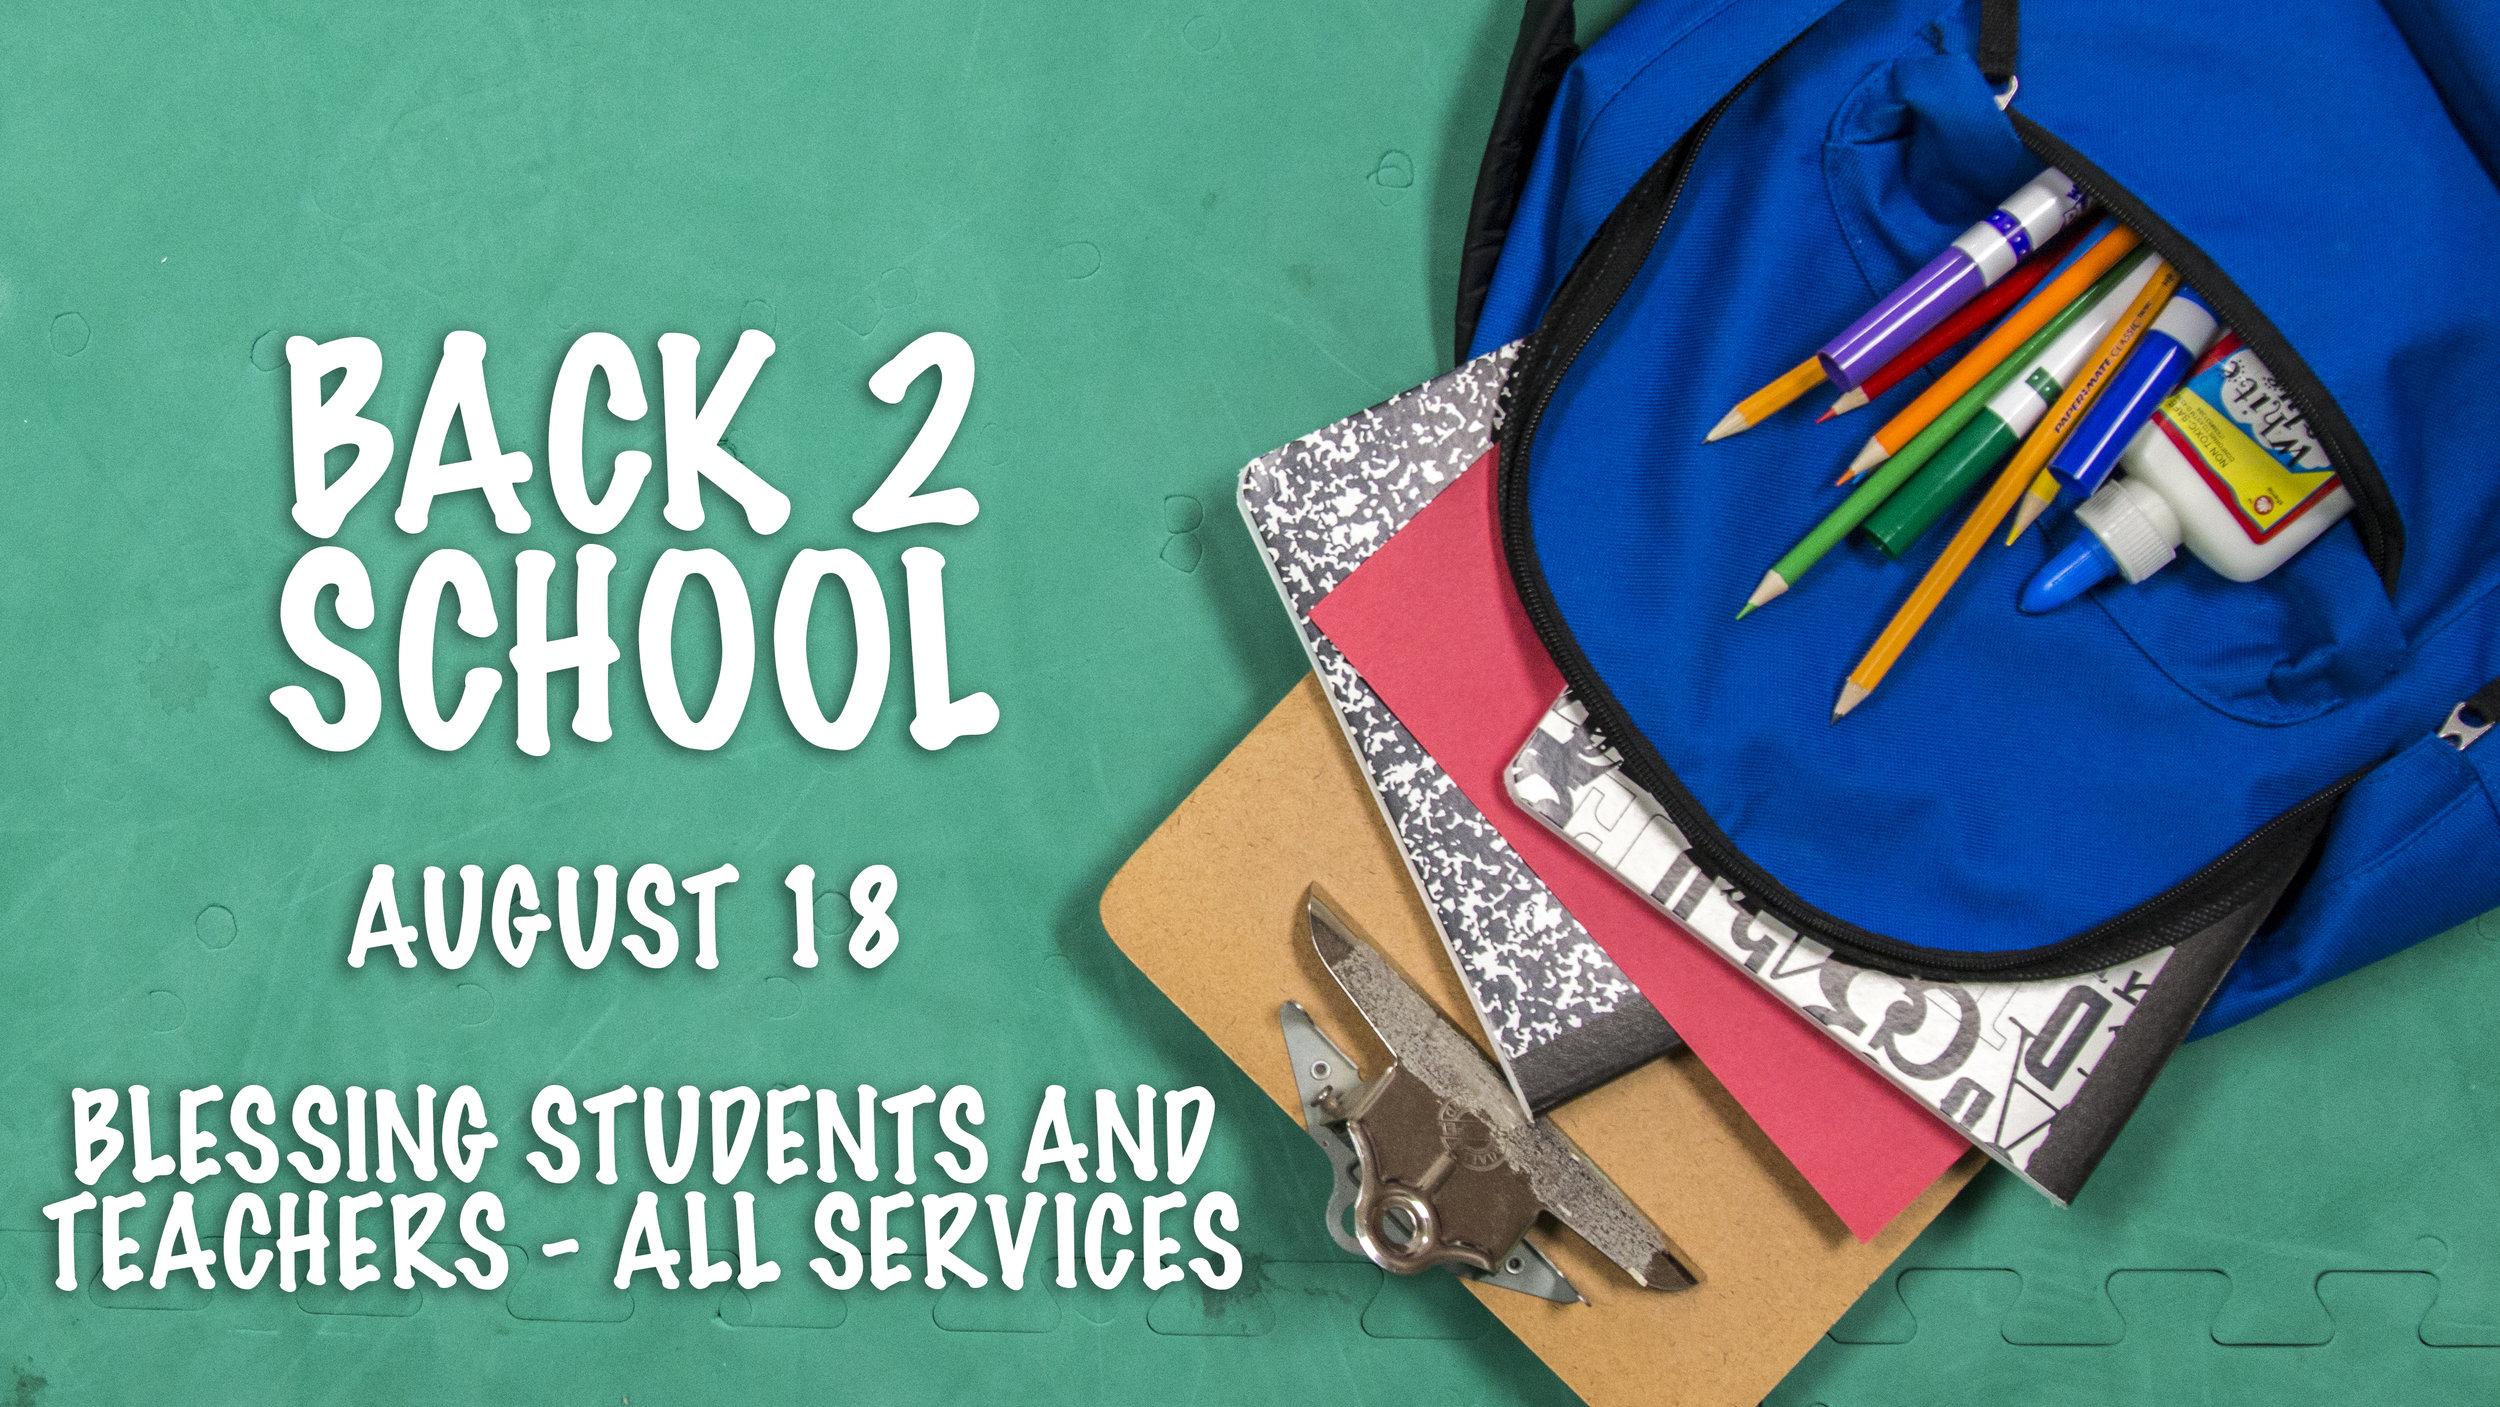 back2school2019.jpg